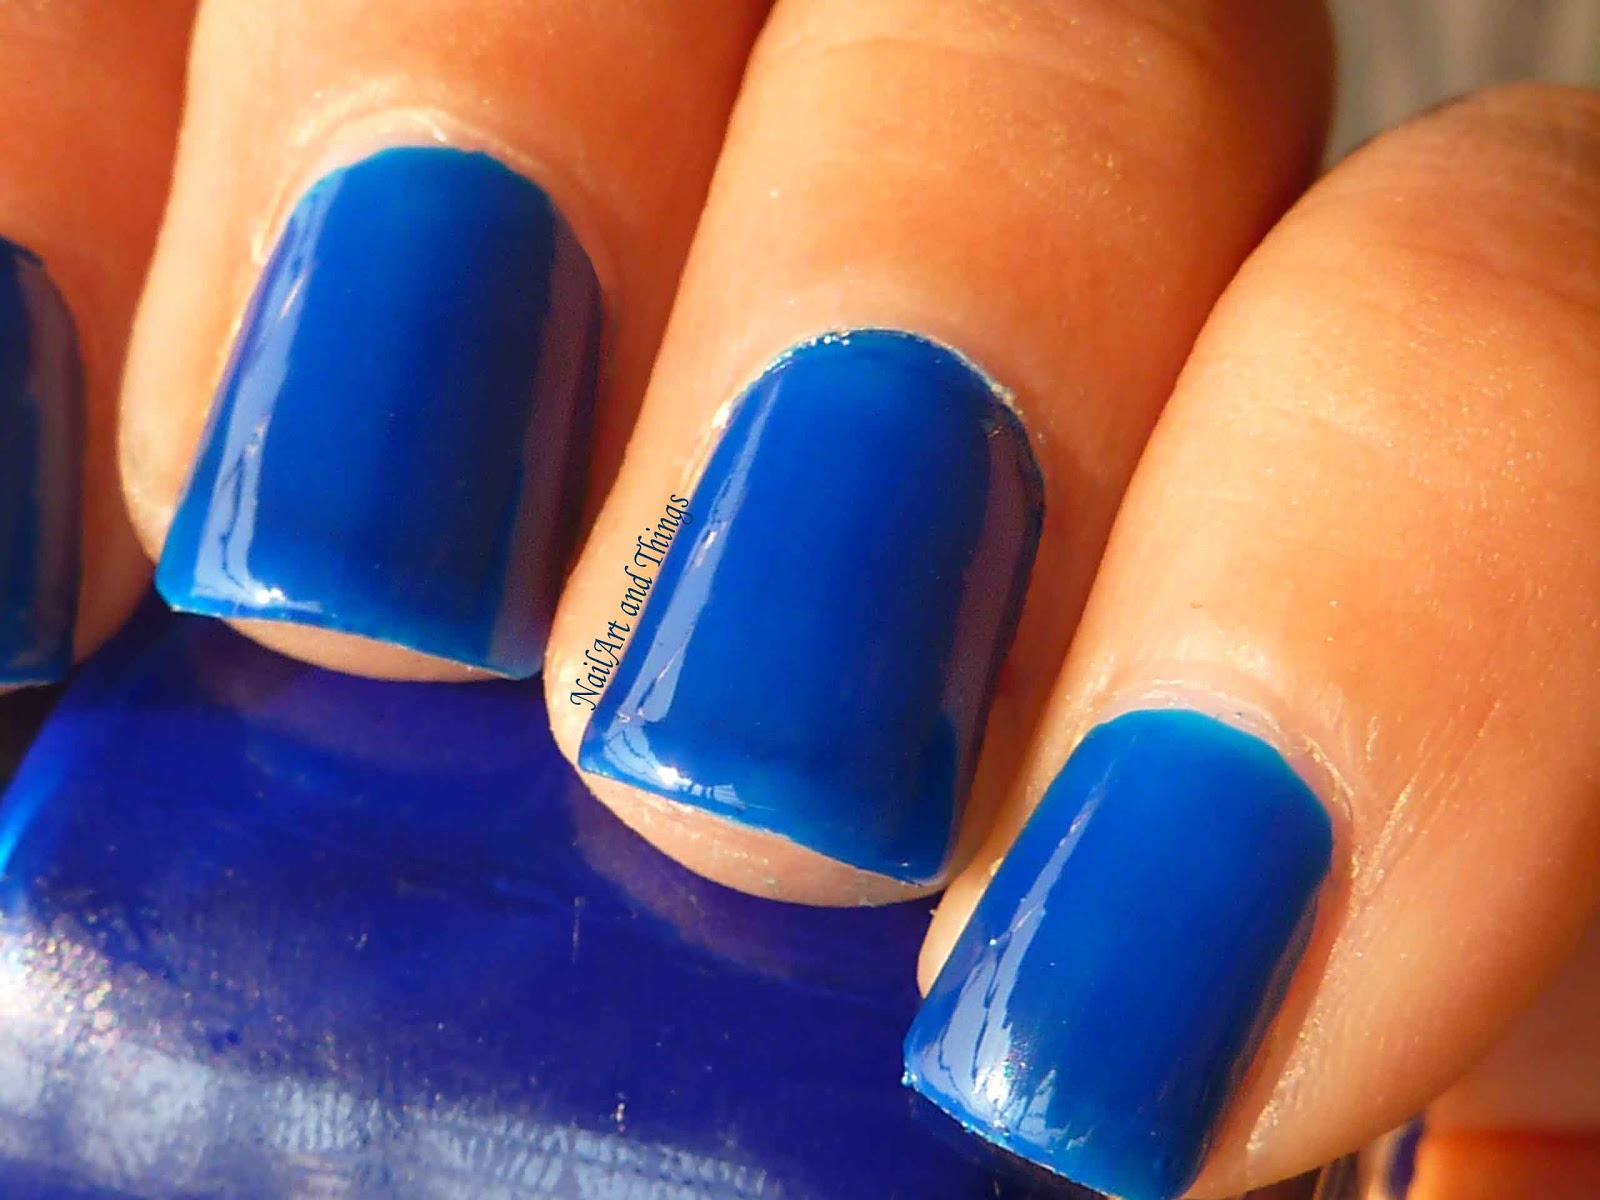 NailArt and Things: Blue Roses Porcelain Nail Art (Jelly ...